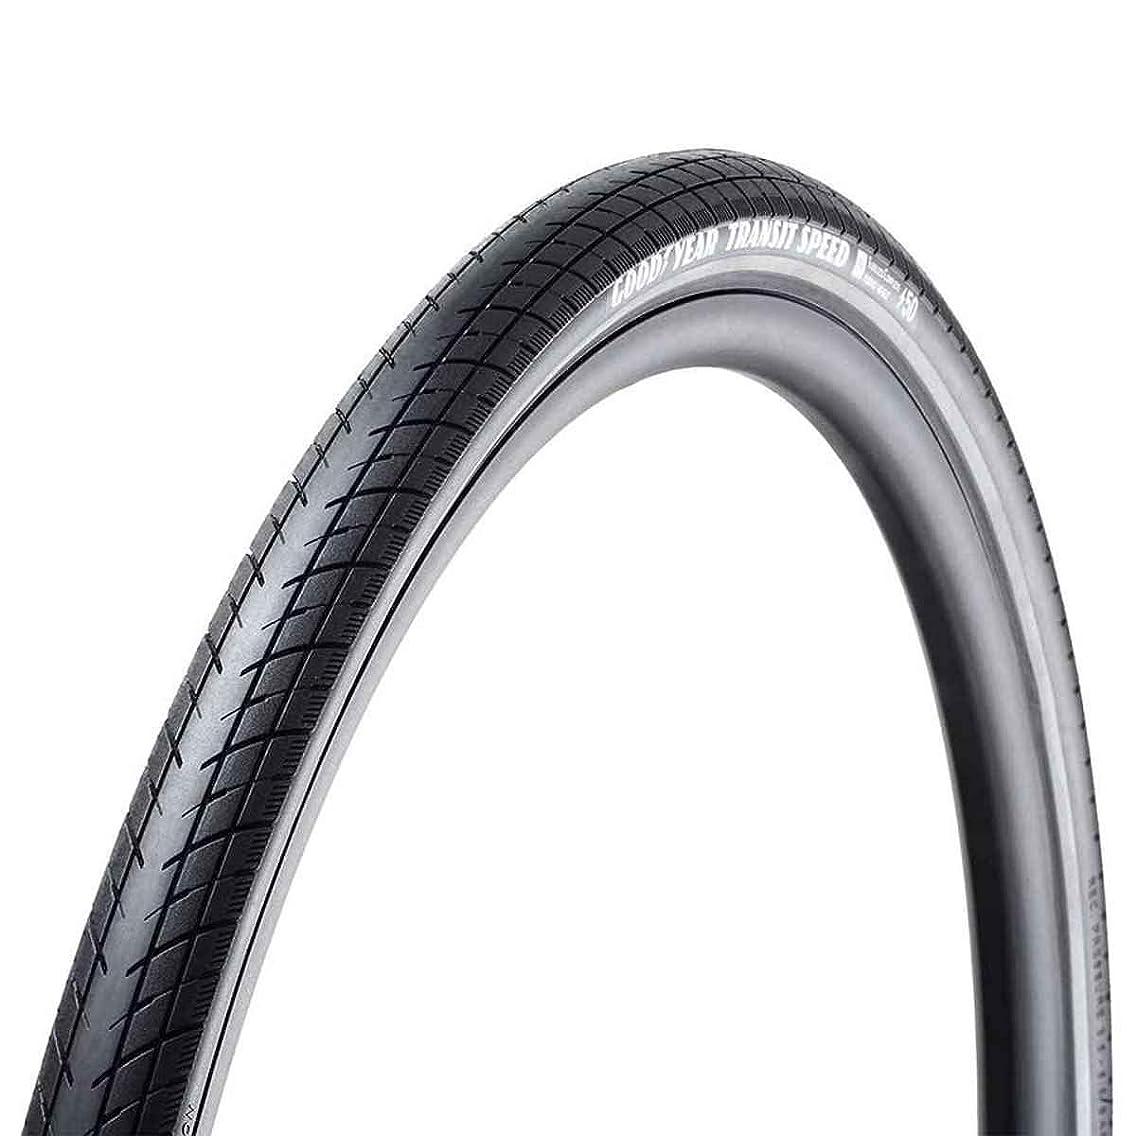 Goodyear, Transit Speed, Tire, 700x40C, Wire, Clincher, Dynamic:Silica4, S3: Shell, 60TPI - GR.006.40.622.V002.R